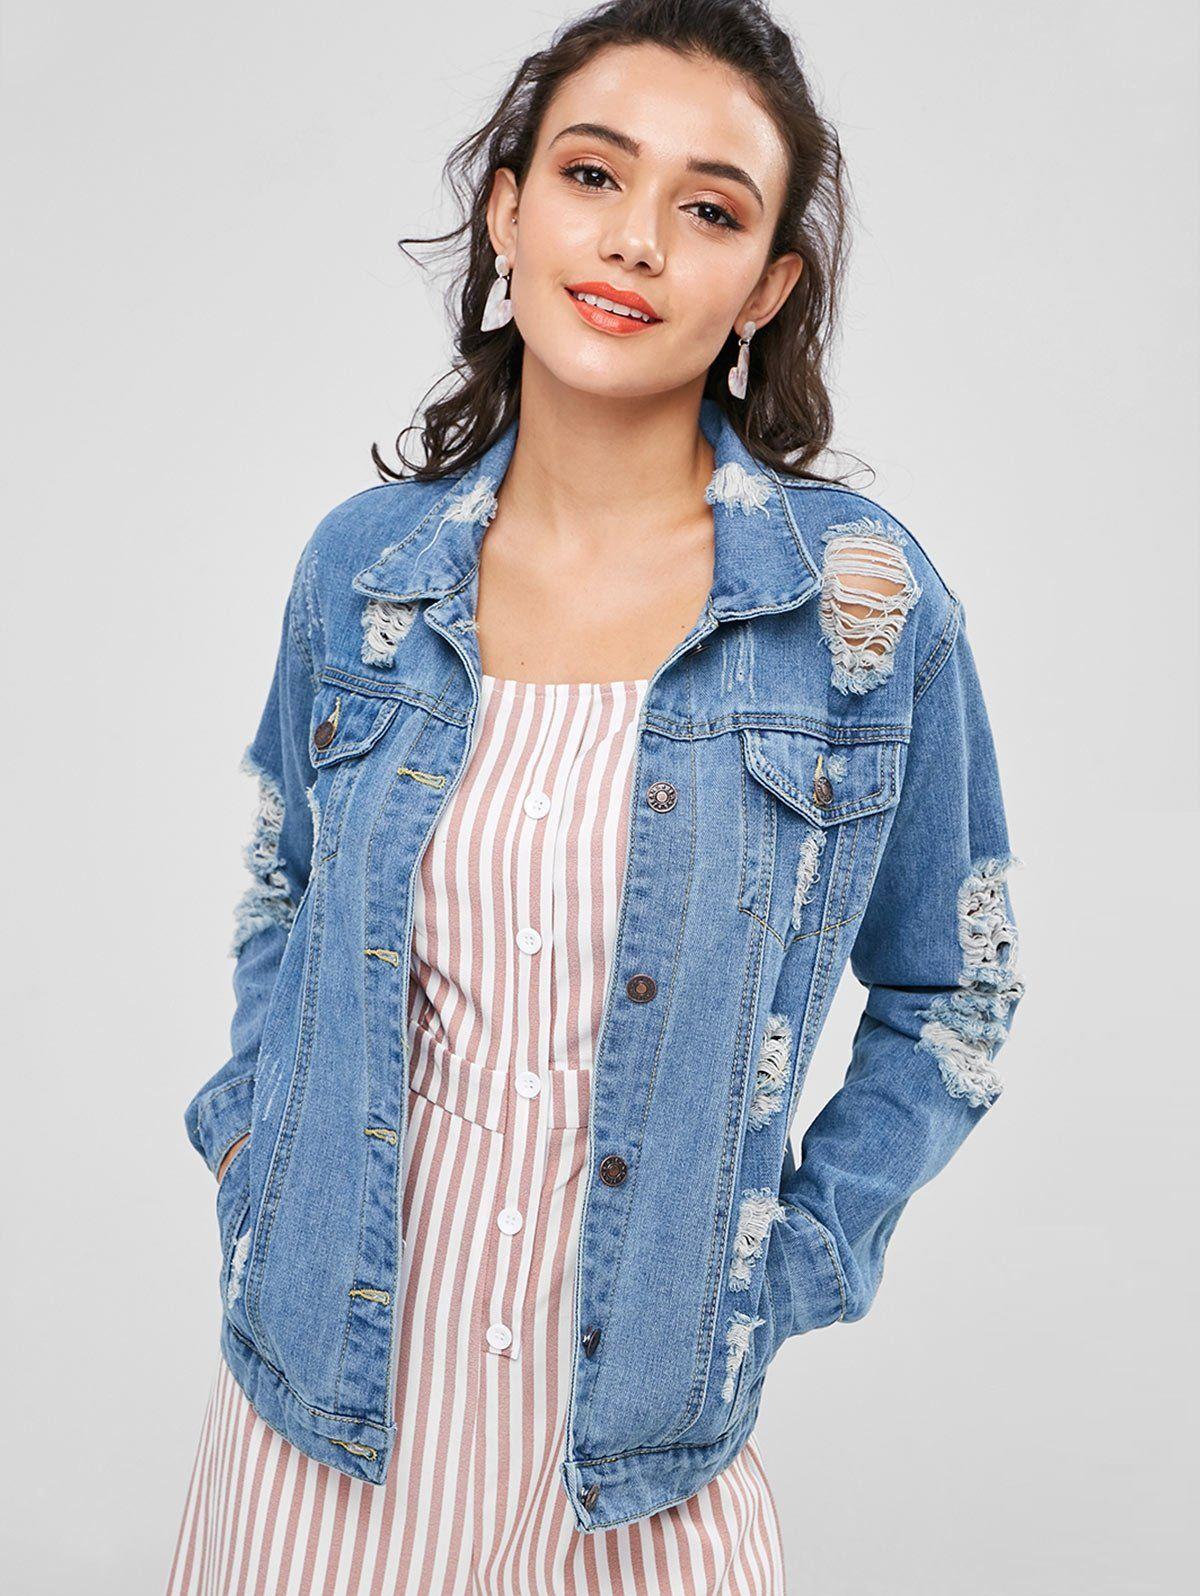 Pin By Liberty On Sweatersm Distressed Denim Jeans Fashion Distressed Denim [ 1596 x 1200 Pixel ]